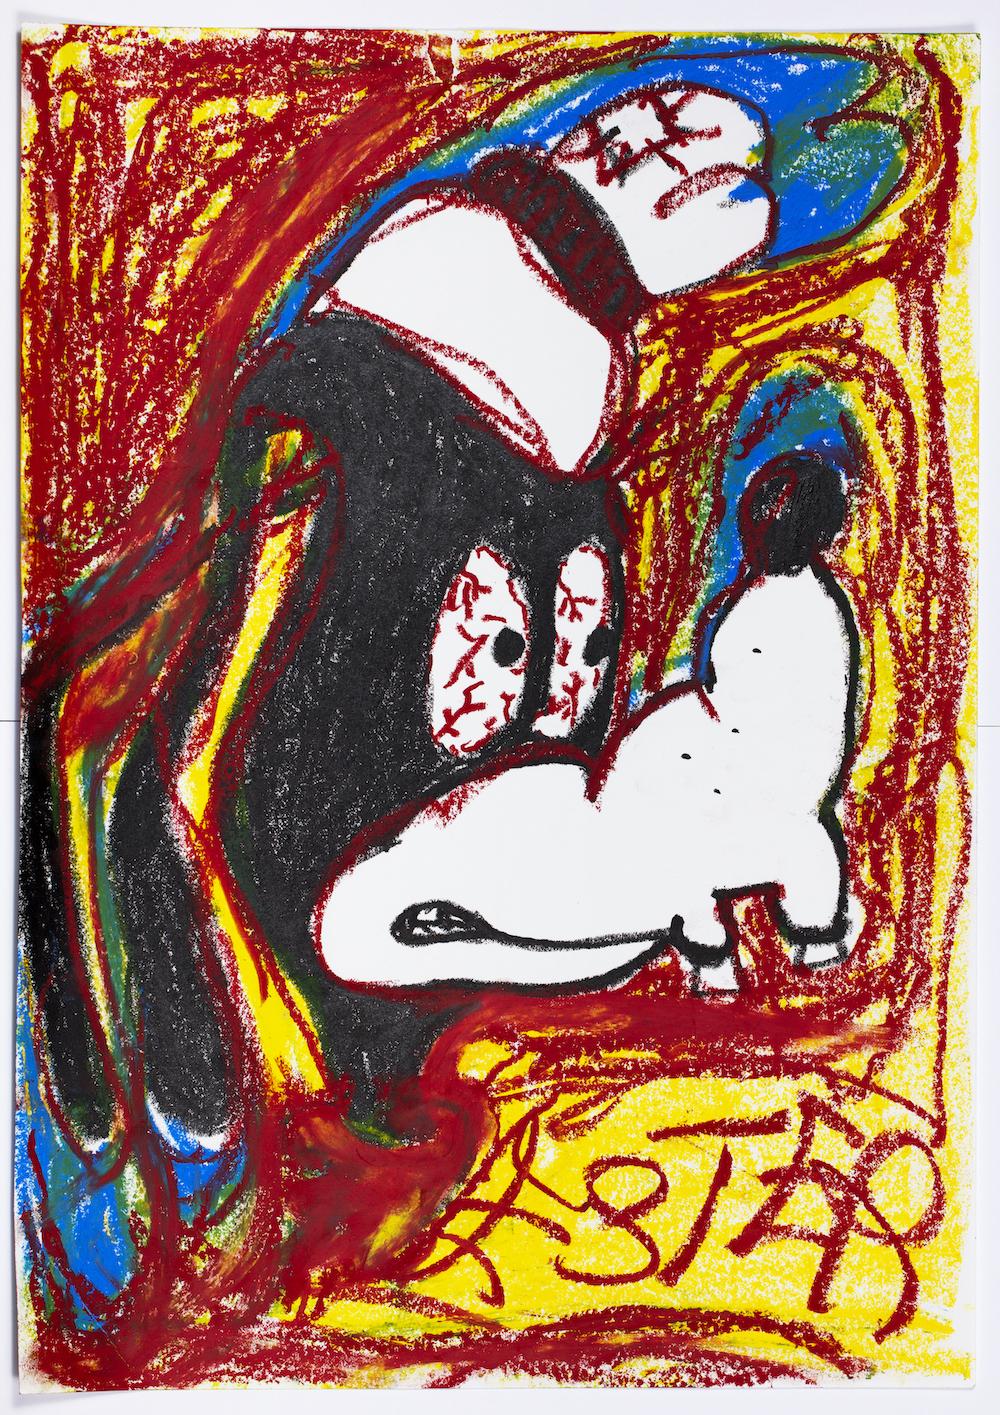 Untitled , 2019. Pastel on paper. 42 x 30 cm.